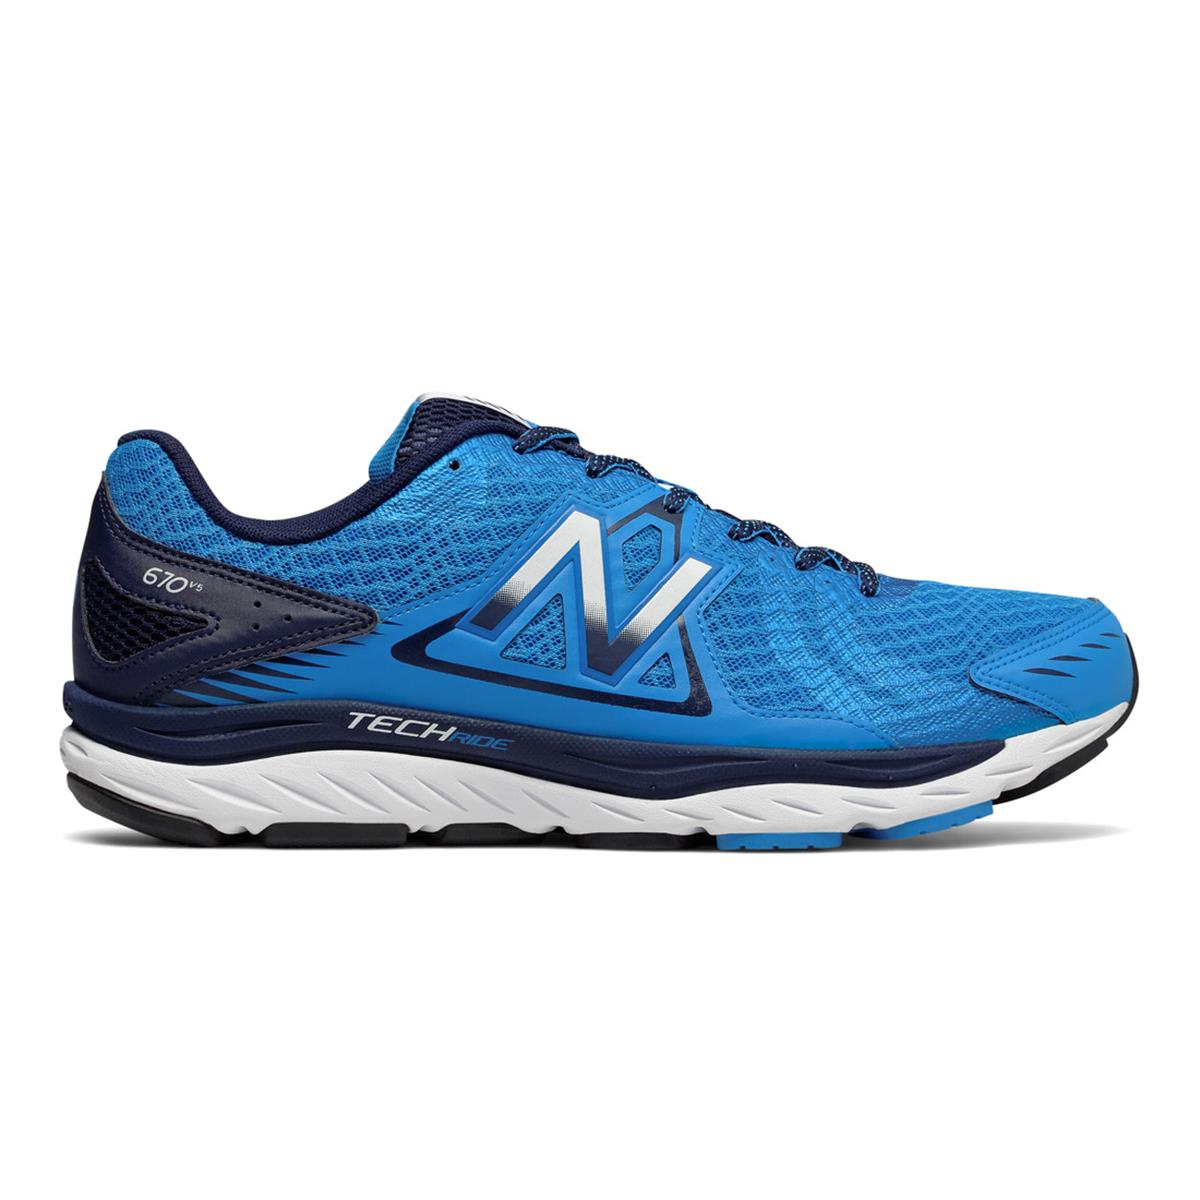 New Balance M670 v5 Mens Running Shoes | Direct Running